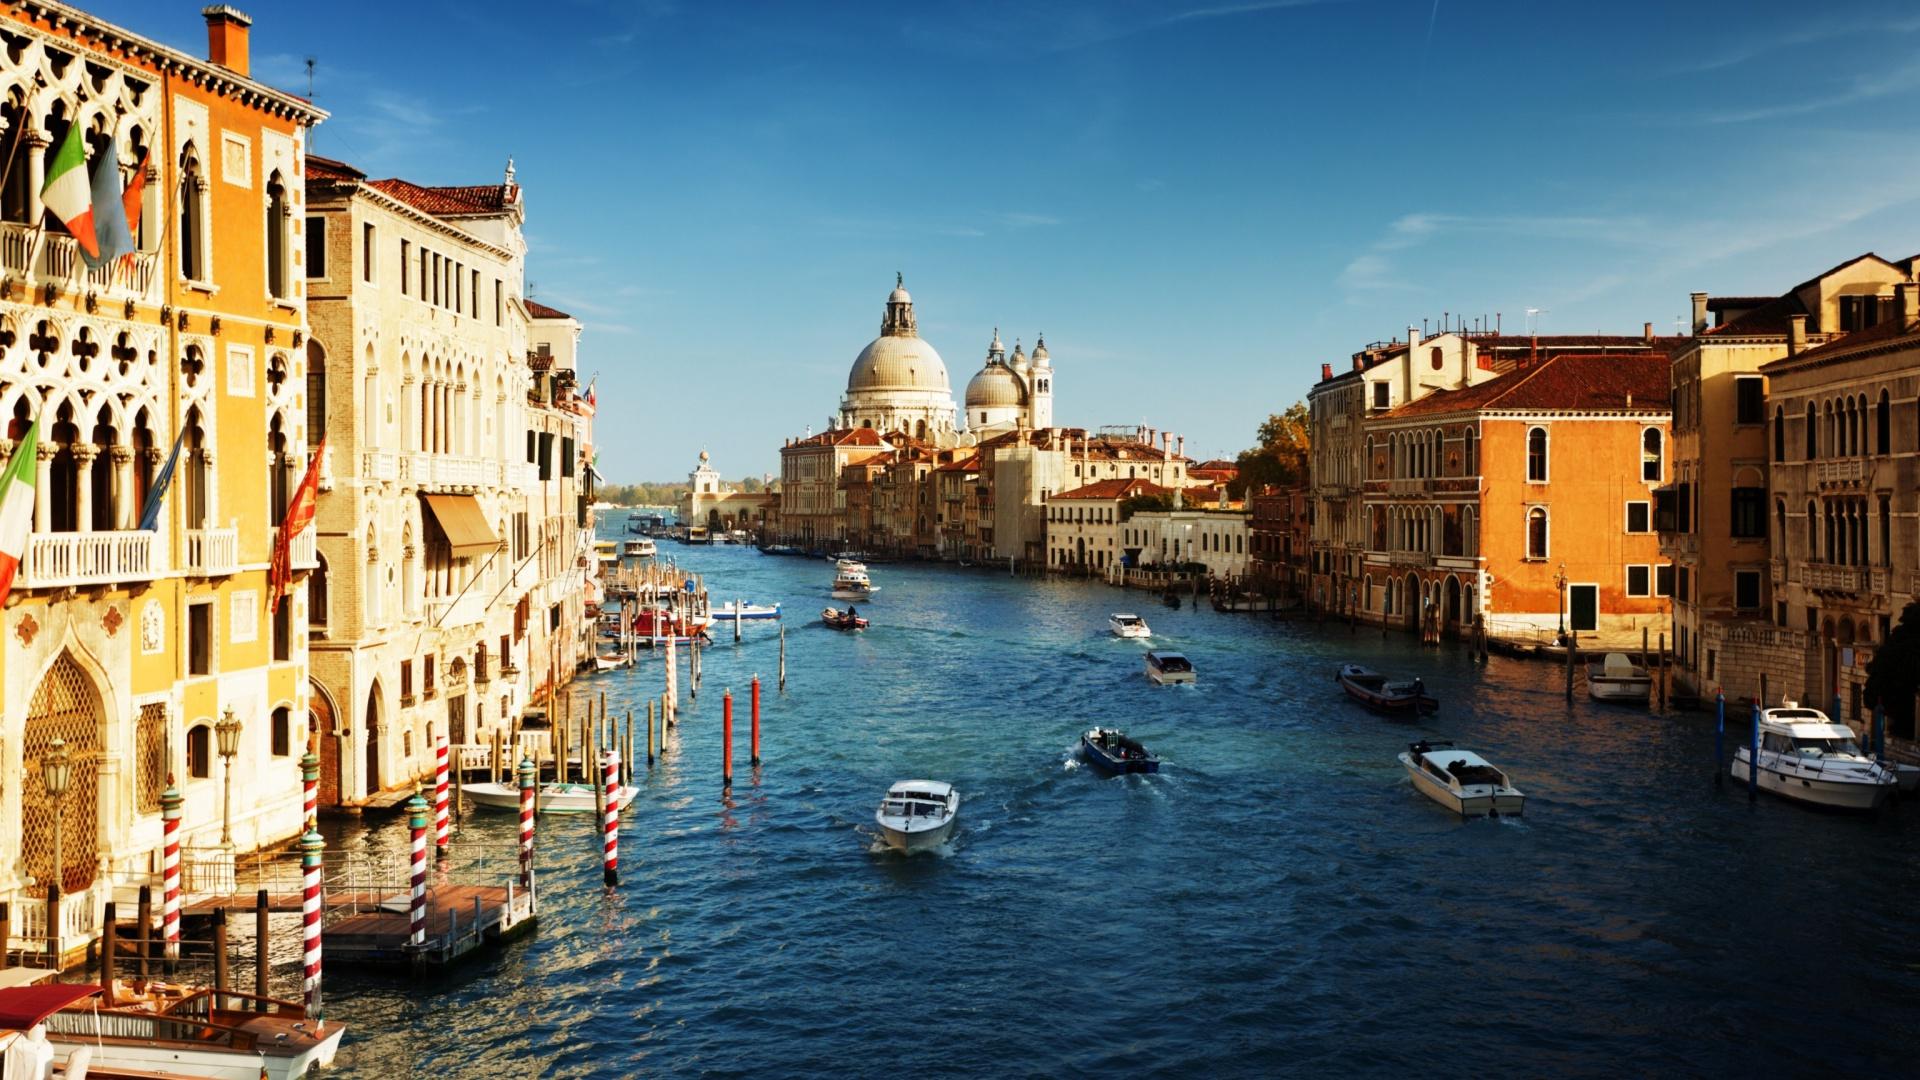 Italy screensavers and wallpaper wallpapersafari - Italy screensaver ...